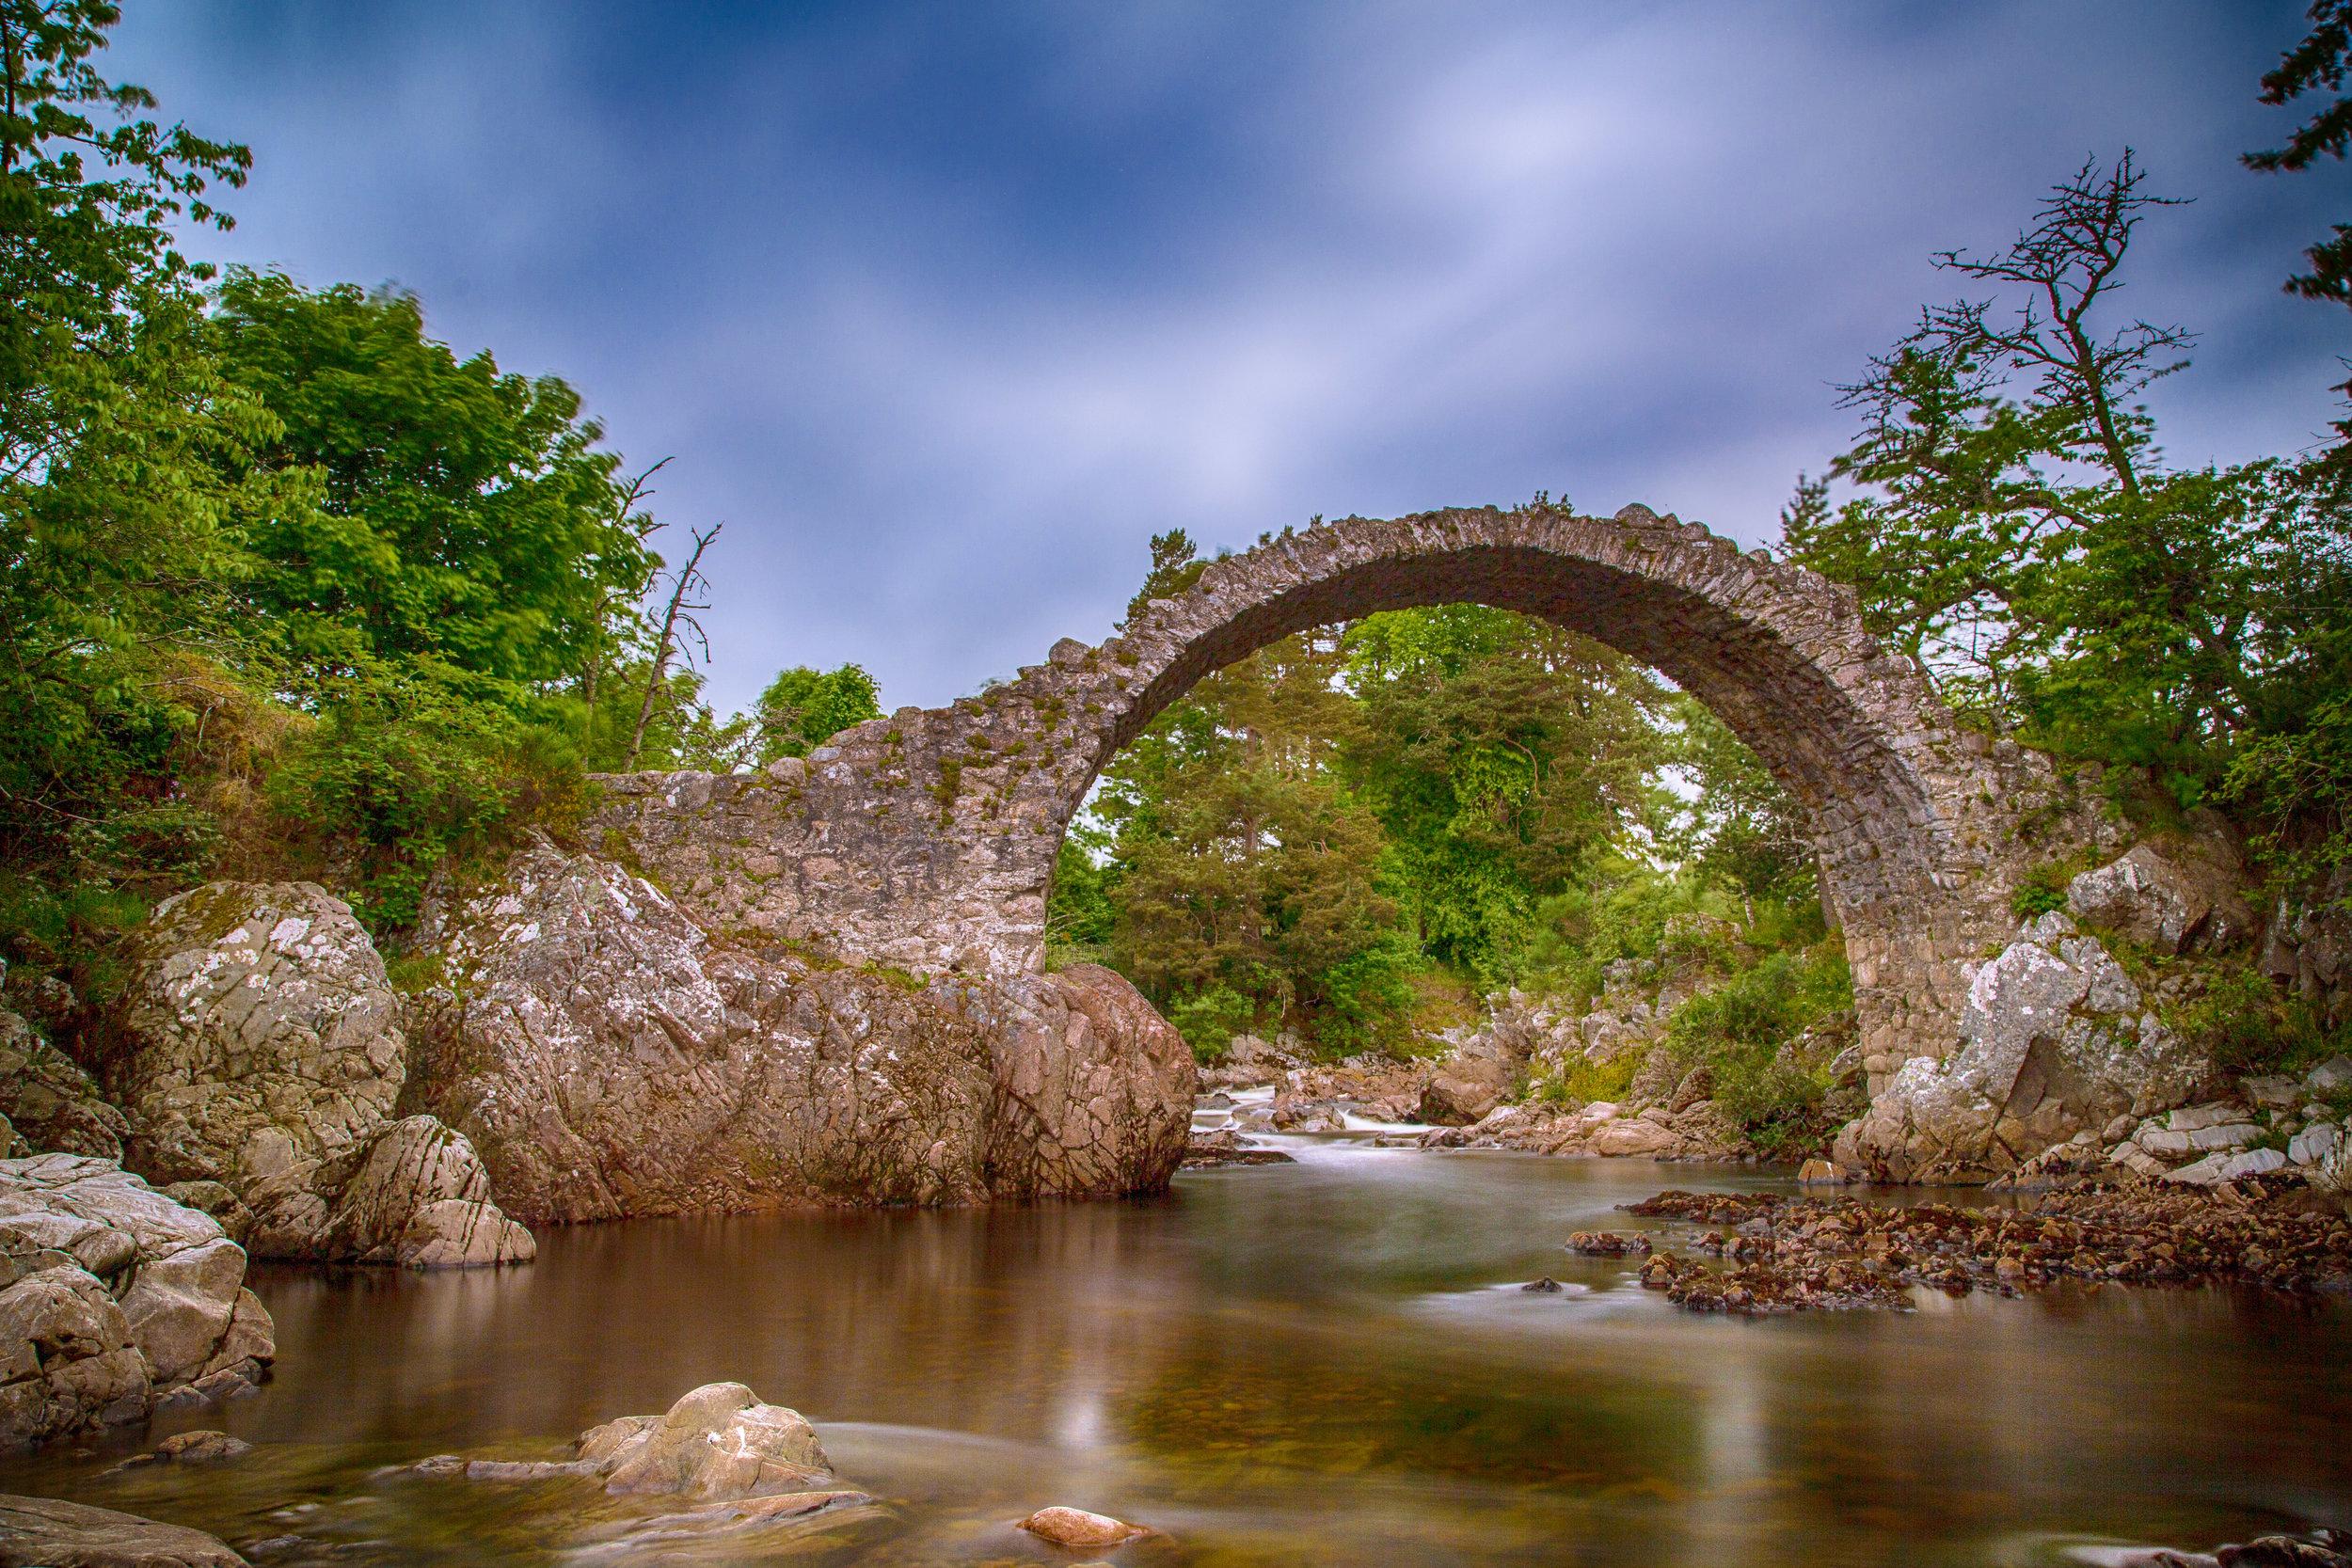 Carrbridge - The old bridge